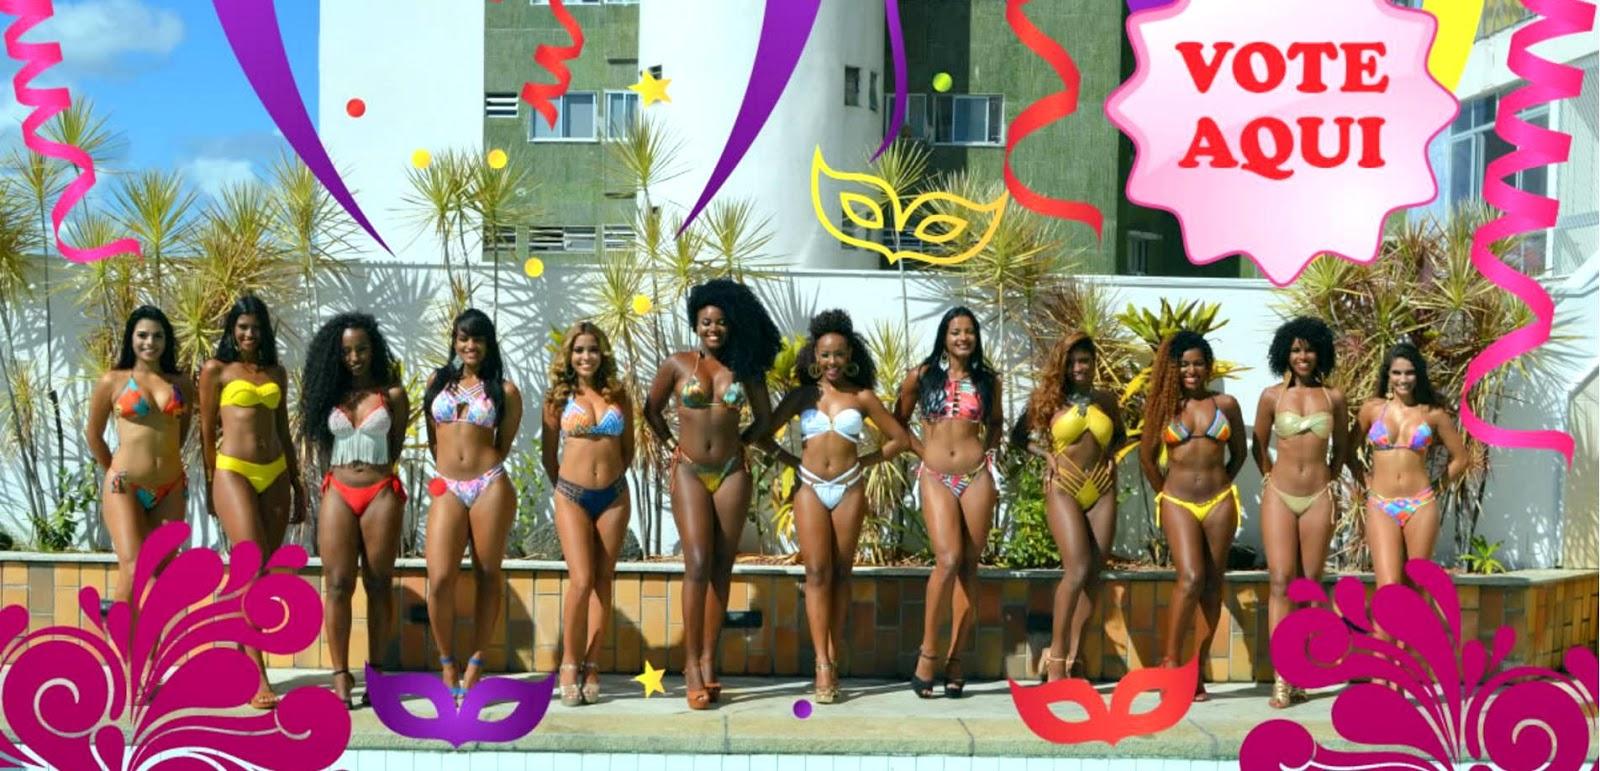 image Carnaval de salvador 1